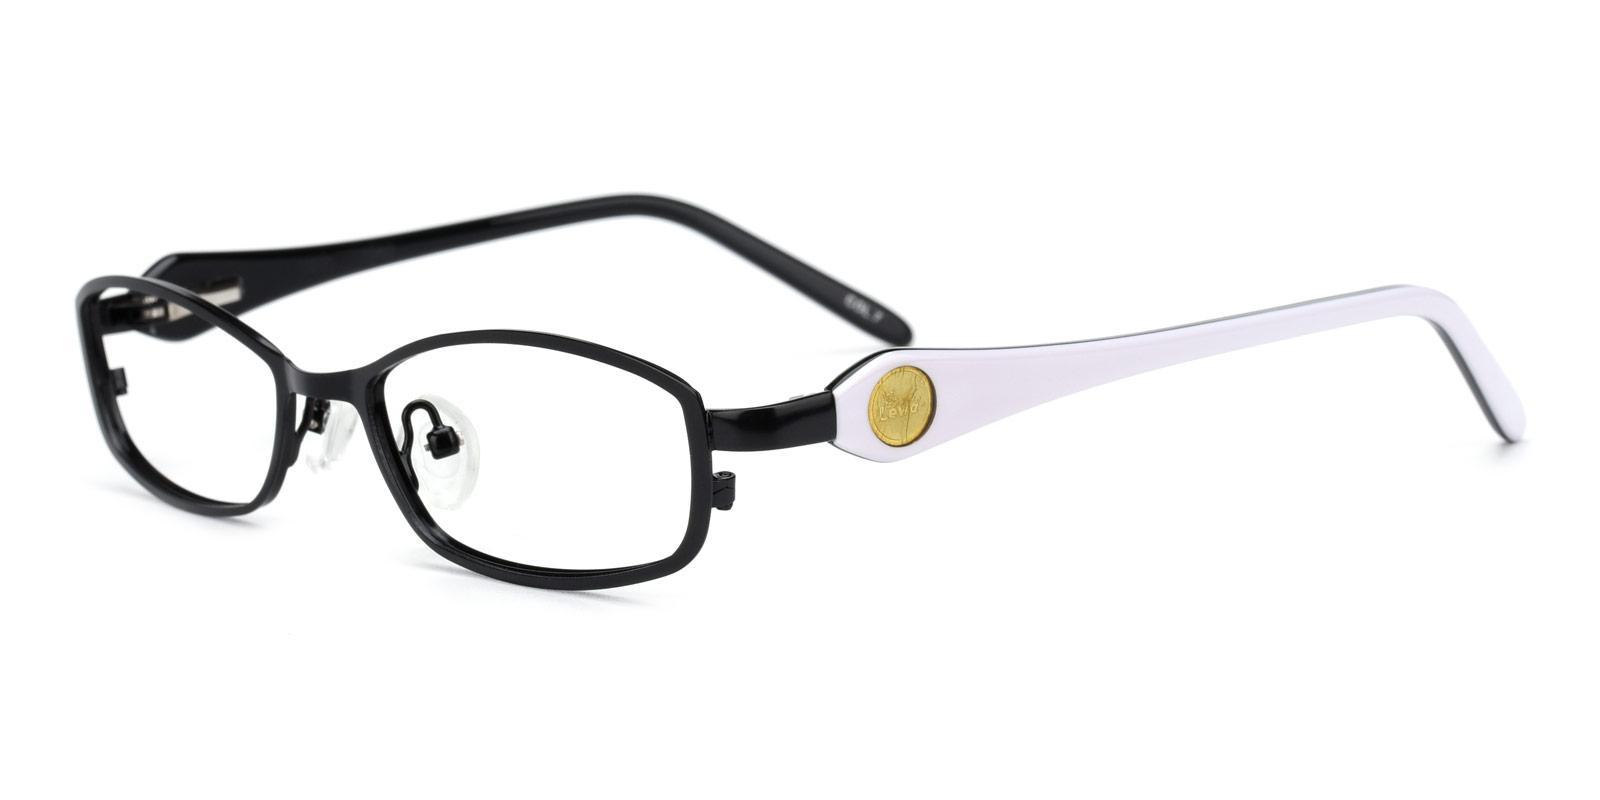 Astronaut-Black-Rectangle-Metal-Eyeglasses-detail